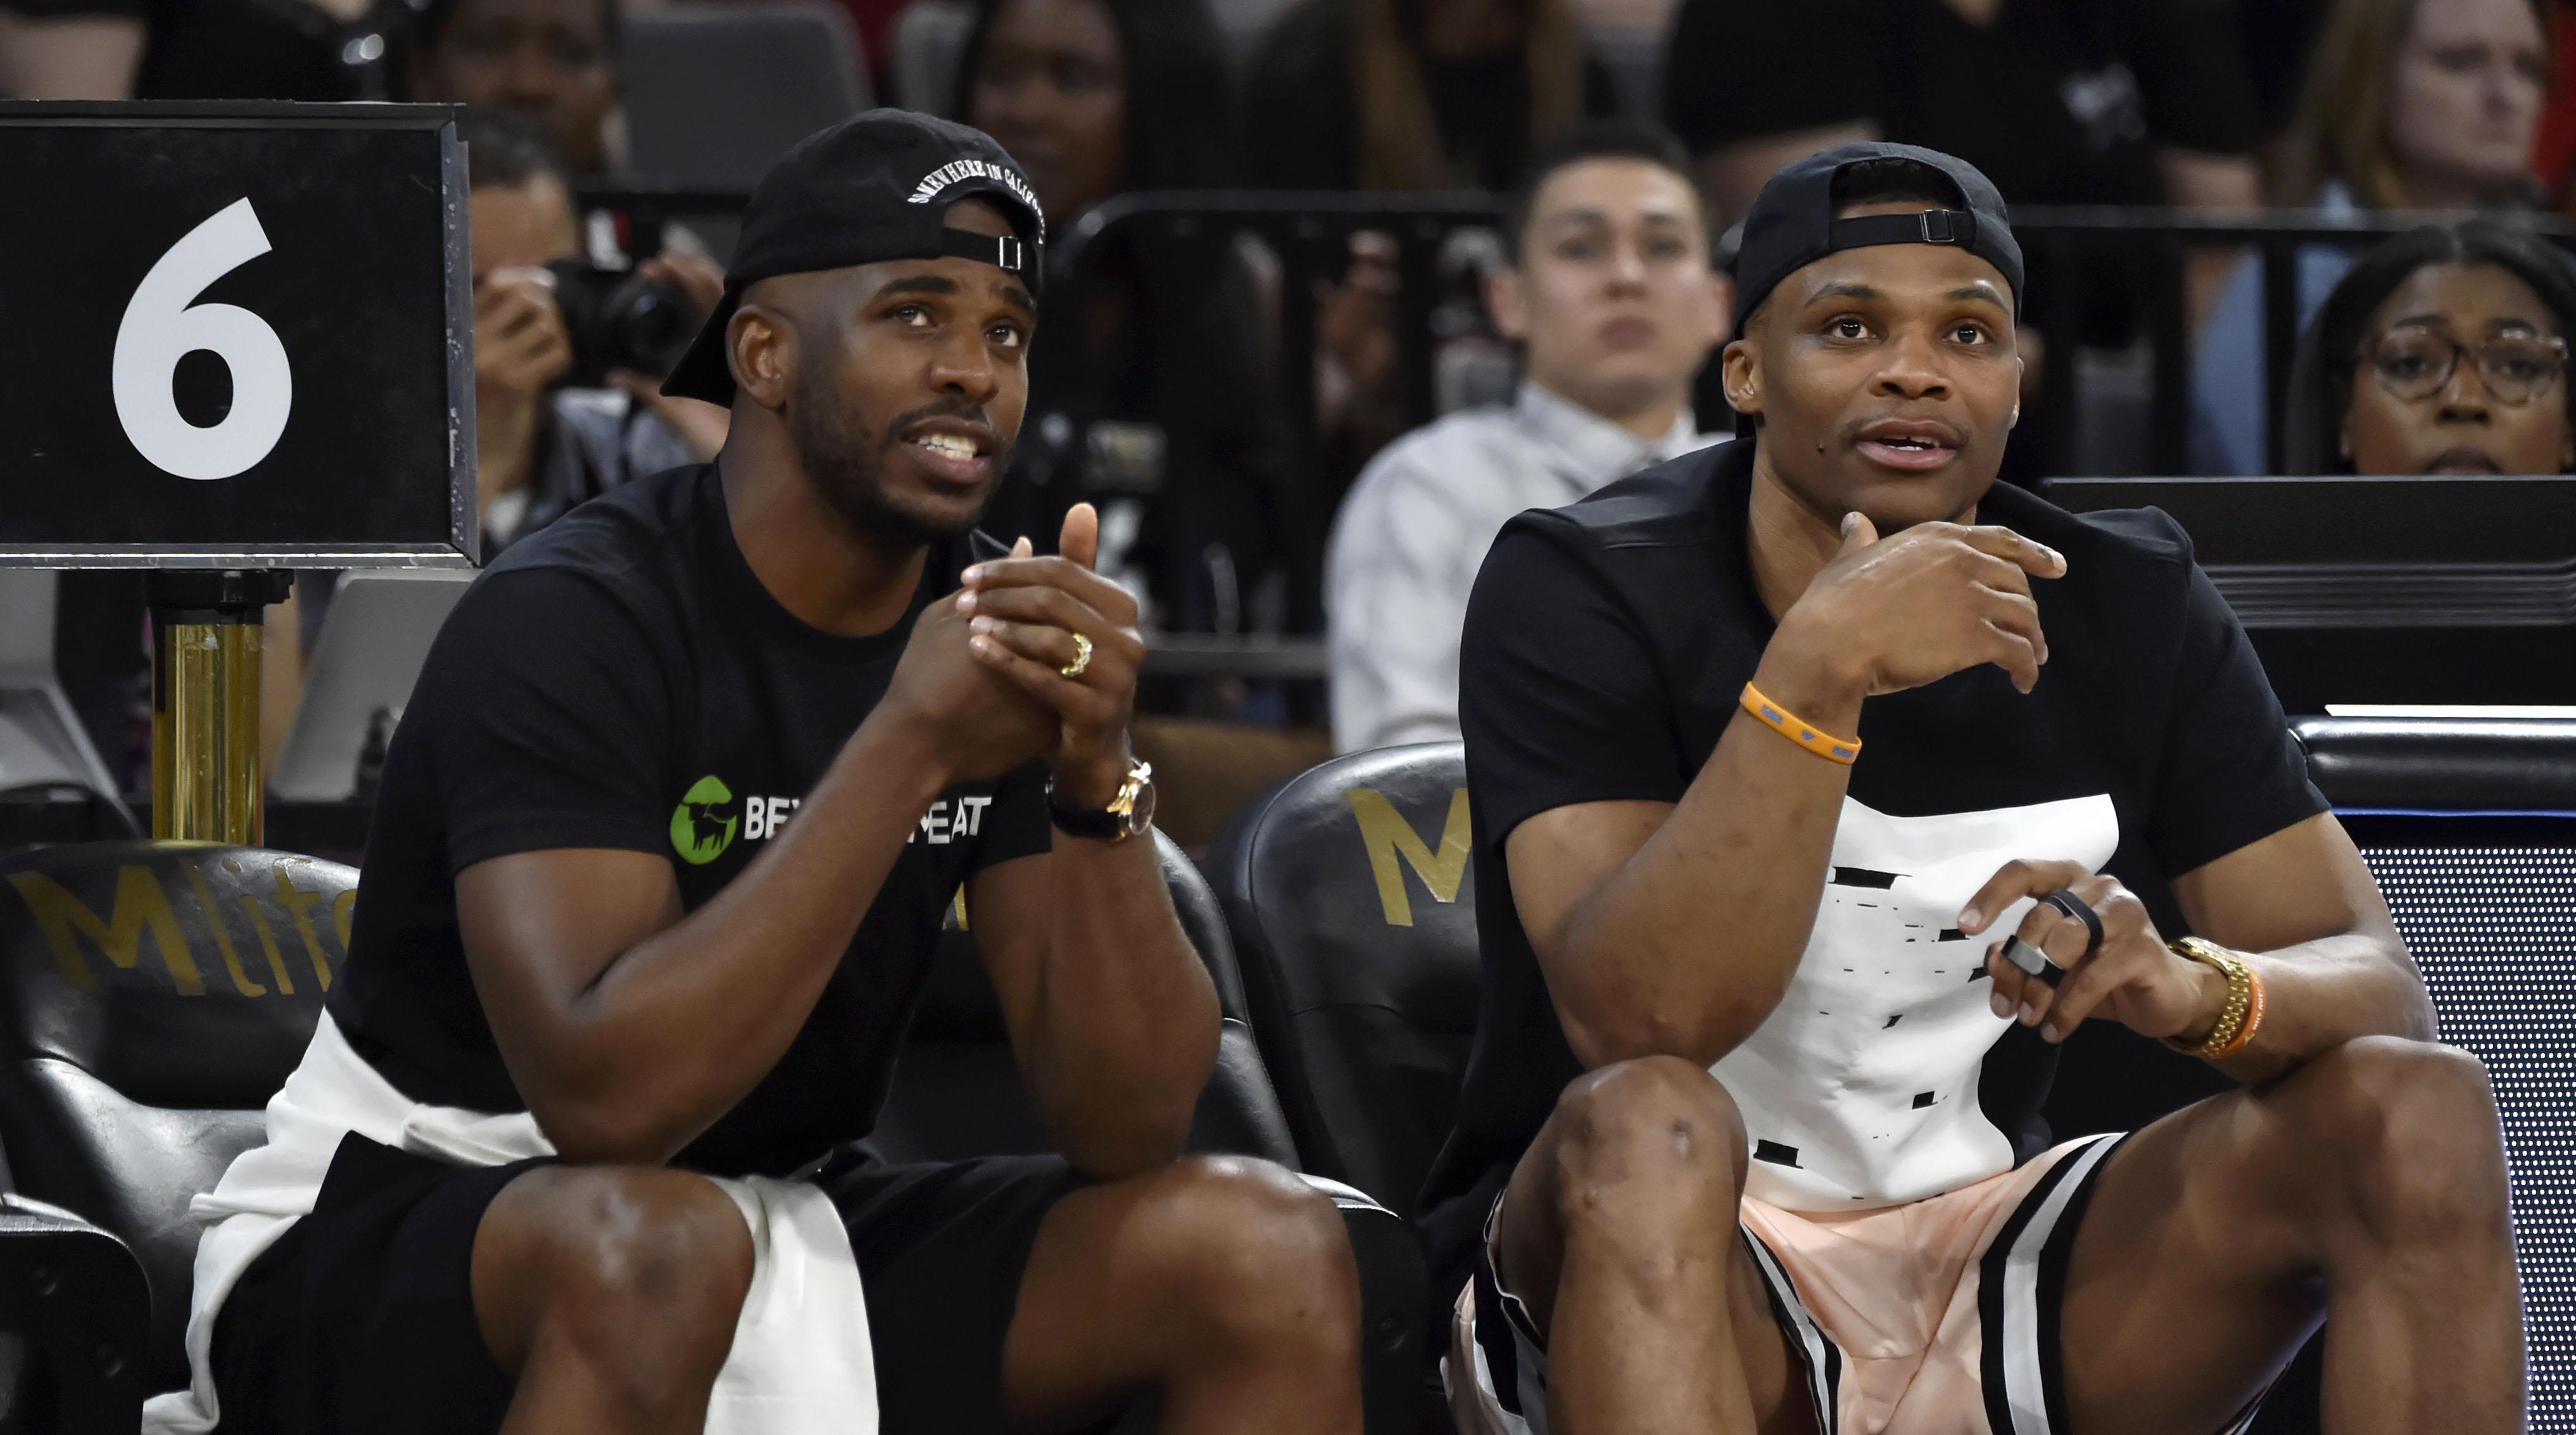 Russell Westbrook Chris Paul trade reactions